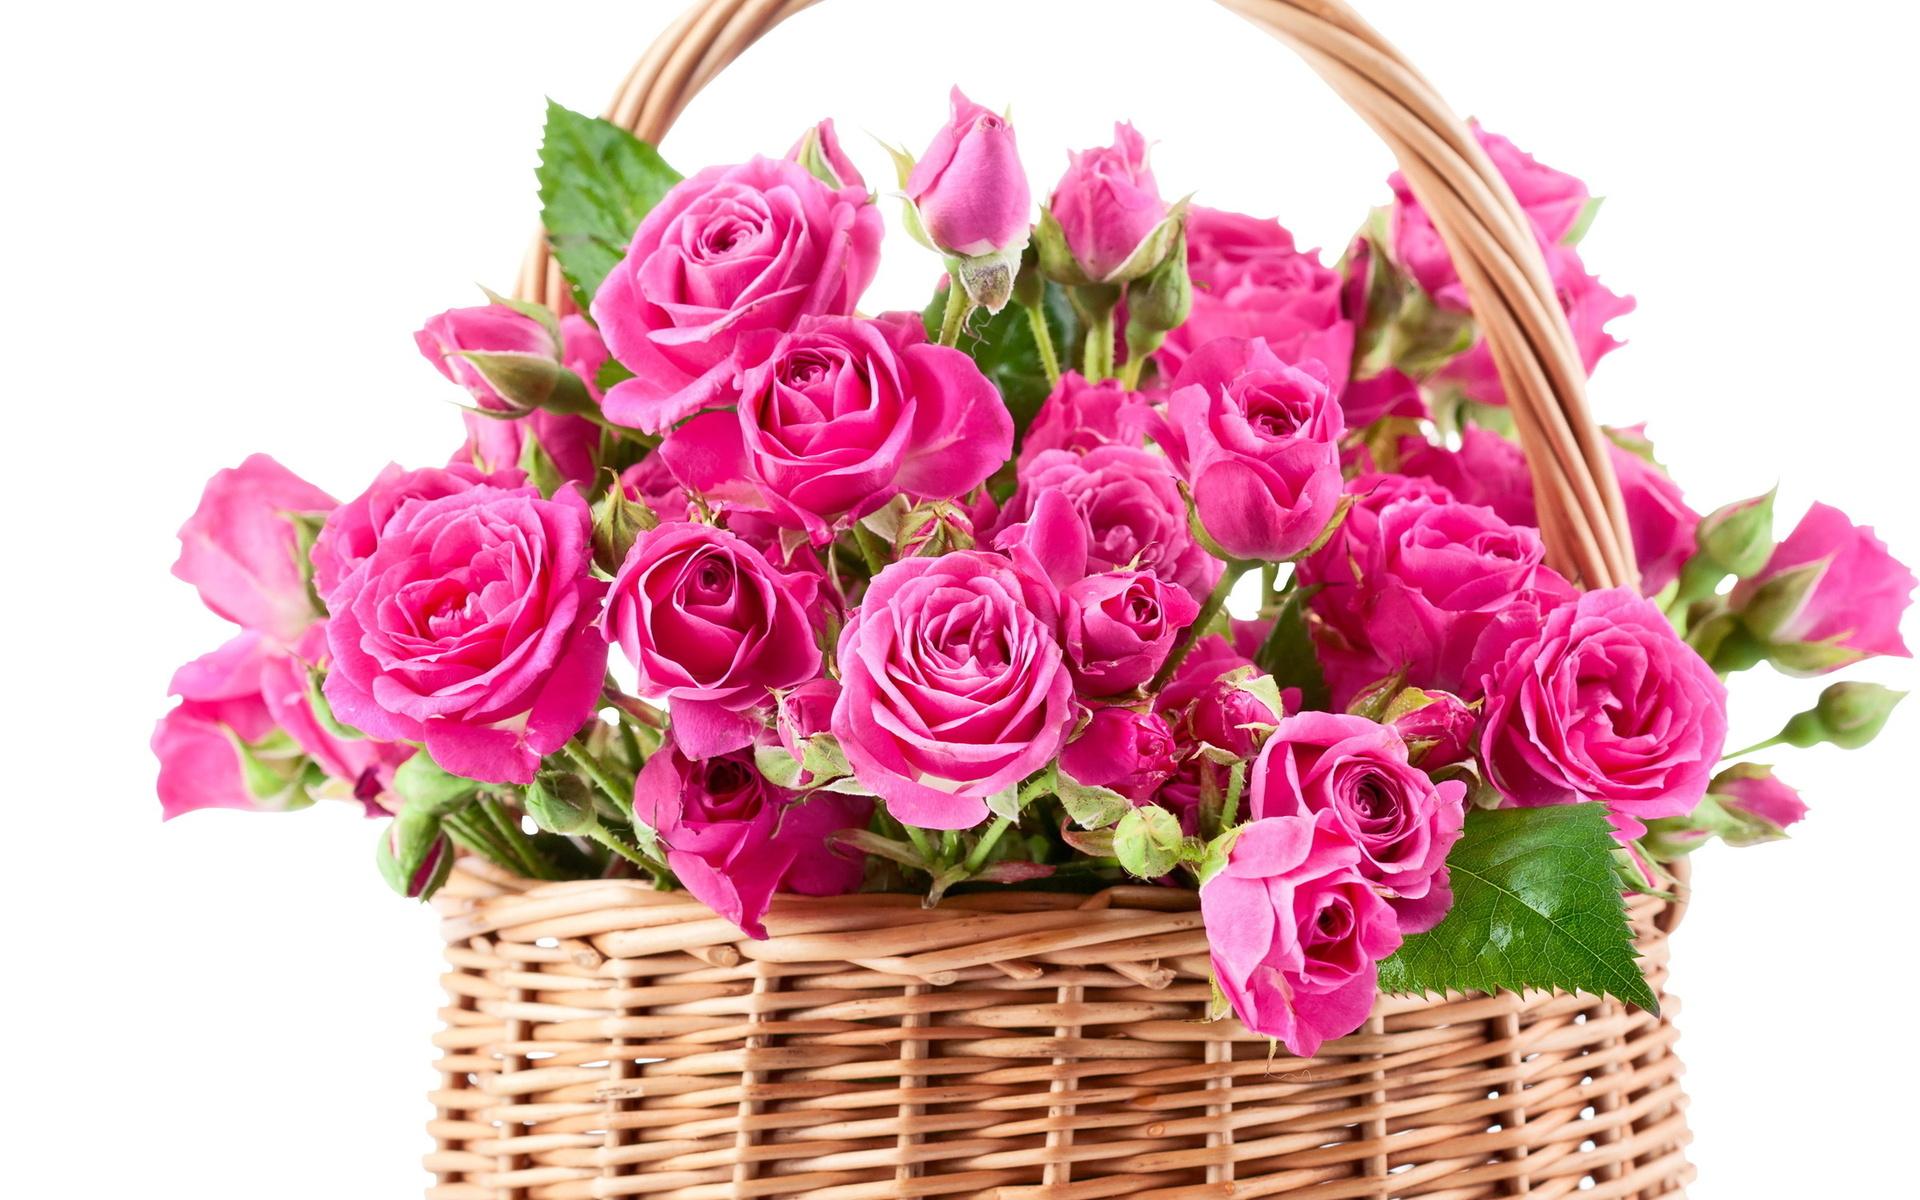 Bouquet clipart beautiful flower For Bokeh Wallpapers  Dudaite